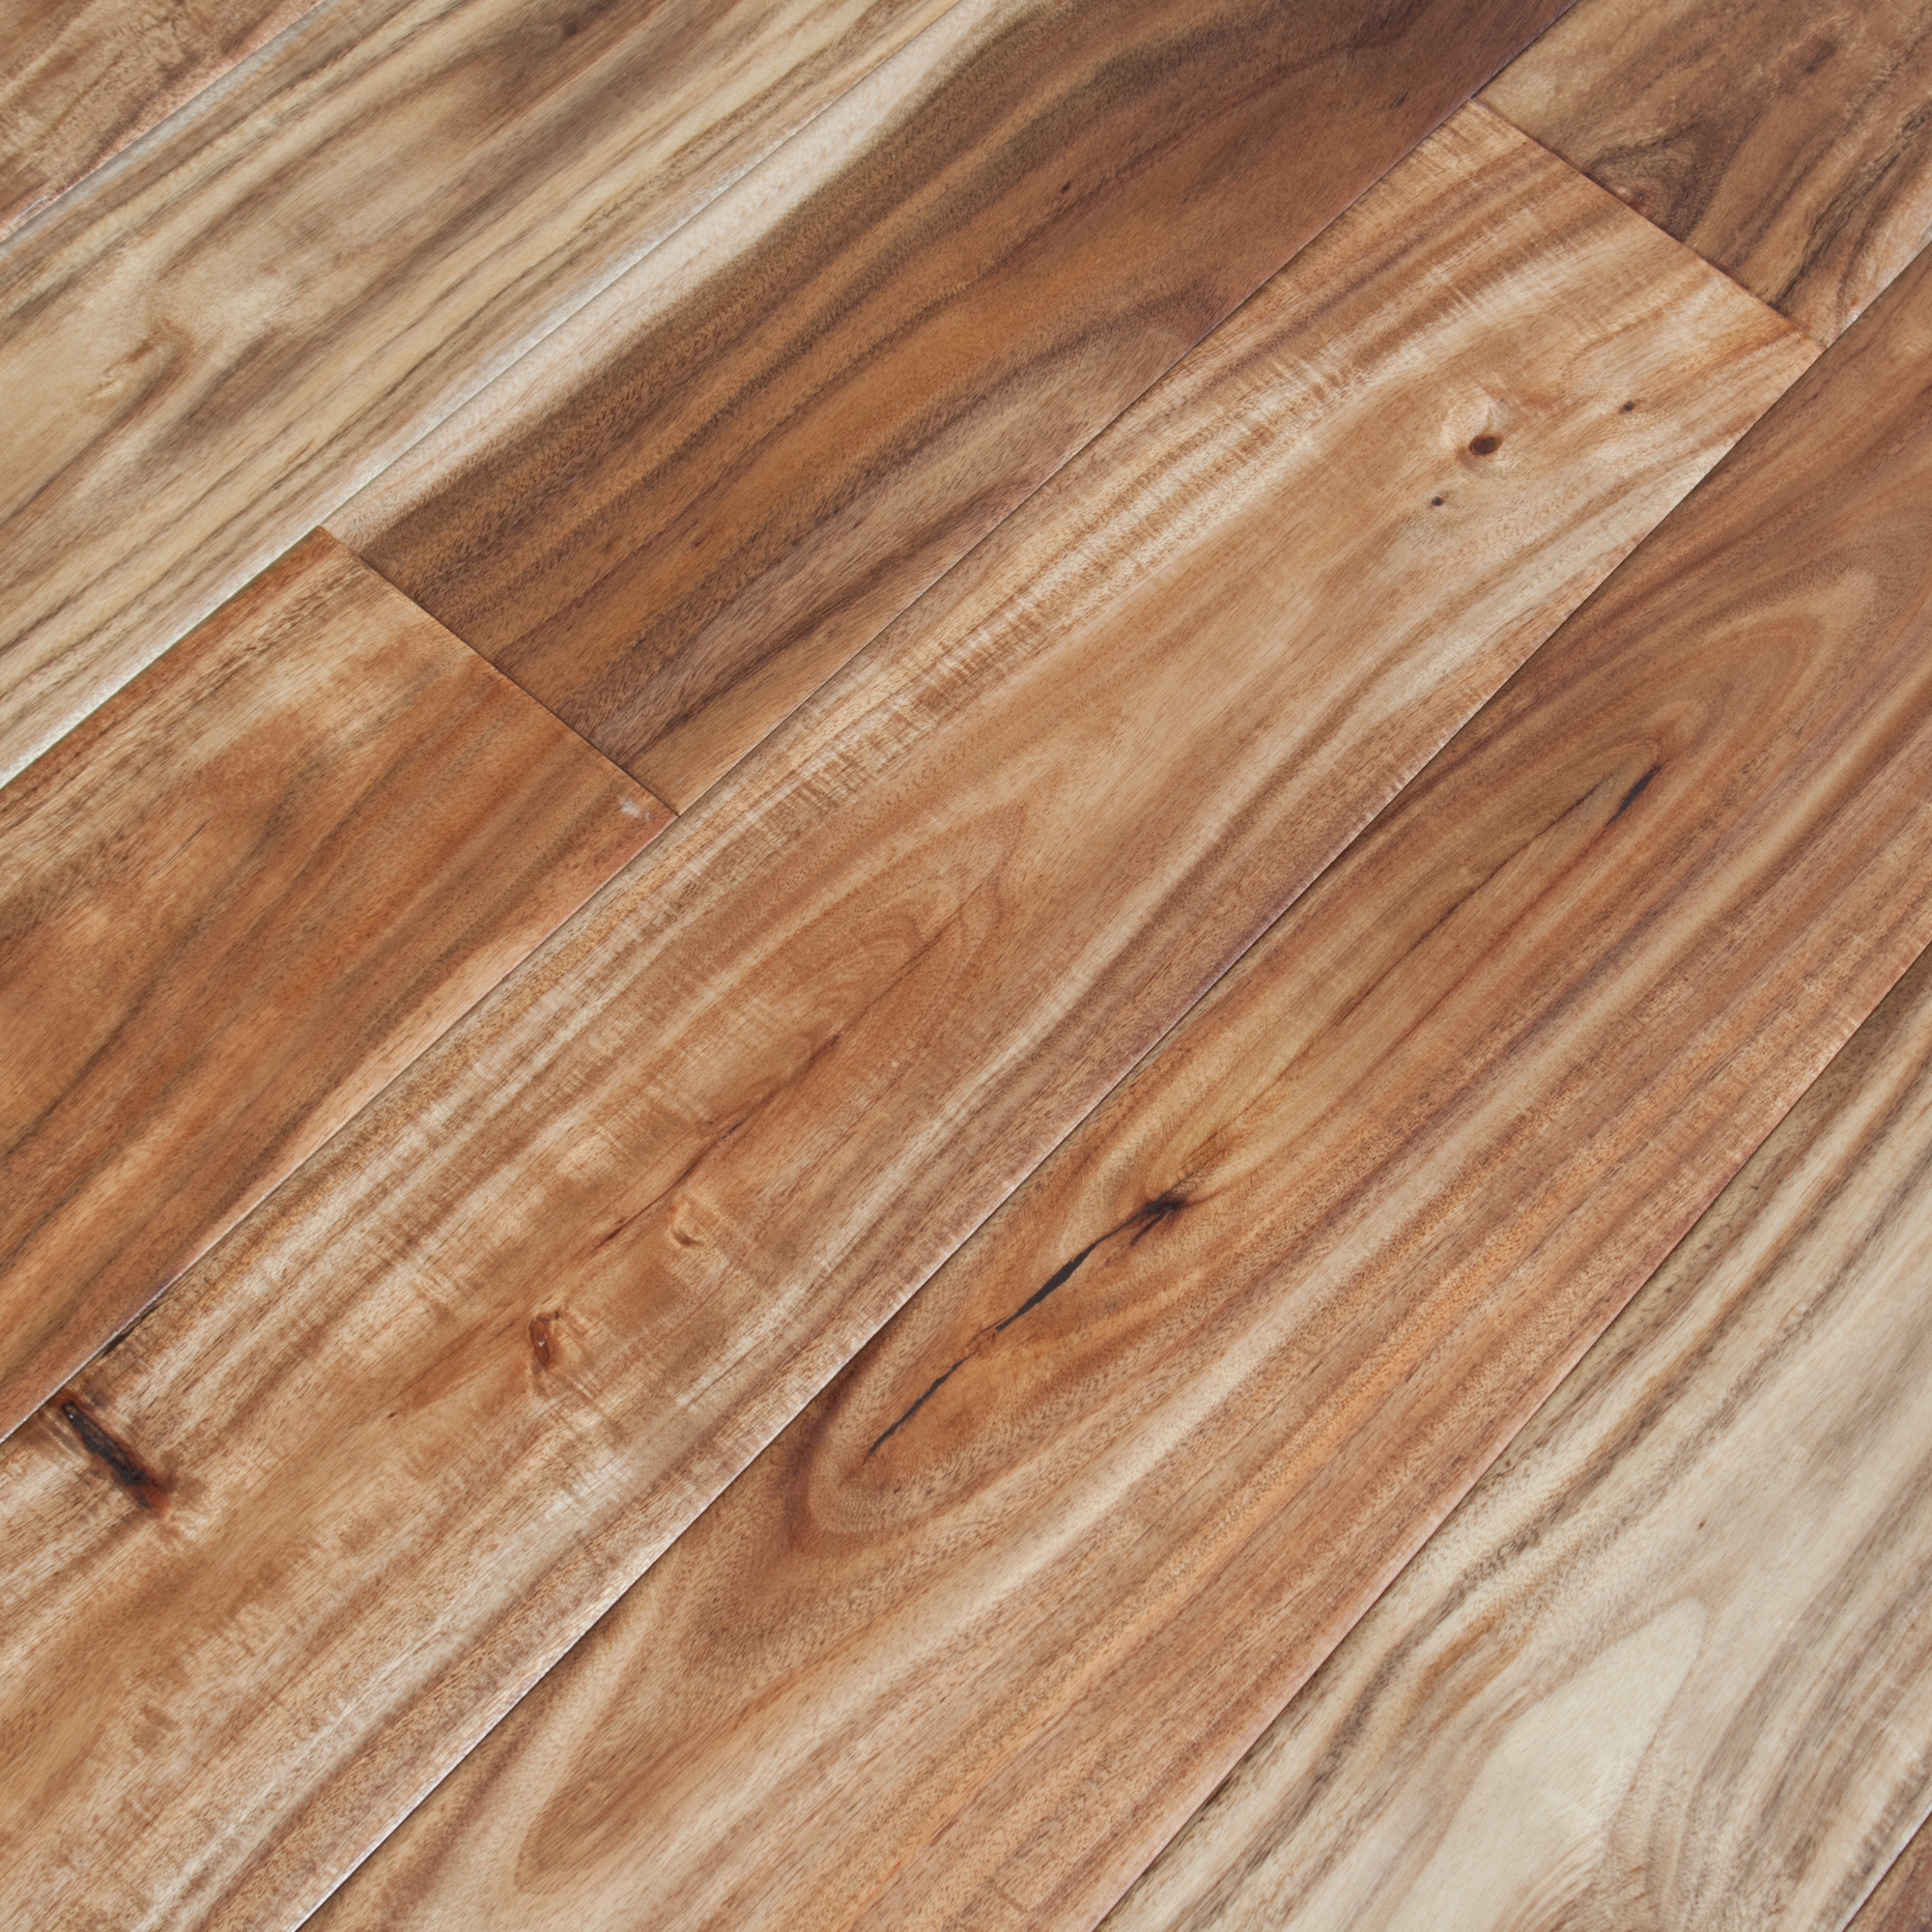 price per square foot hardwood floors installed of 9 mile creek acacia hand scraped acacia confusa wood floors with acacia handscraped natural hardwood flooring